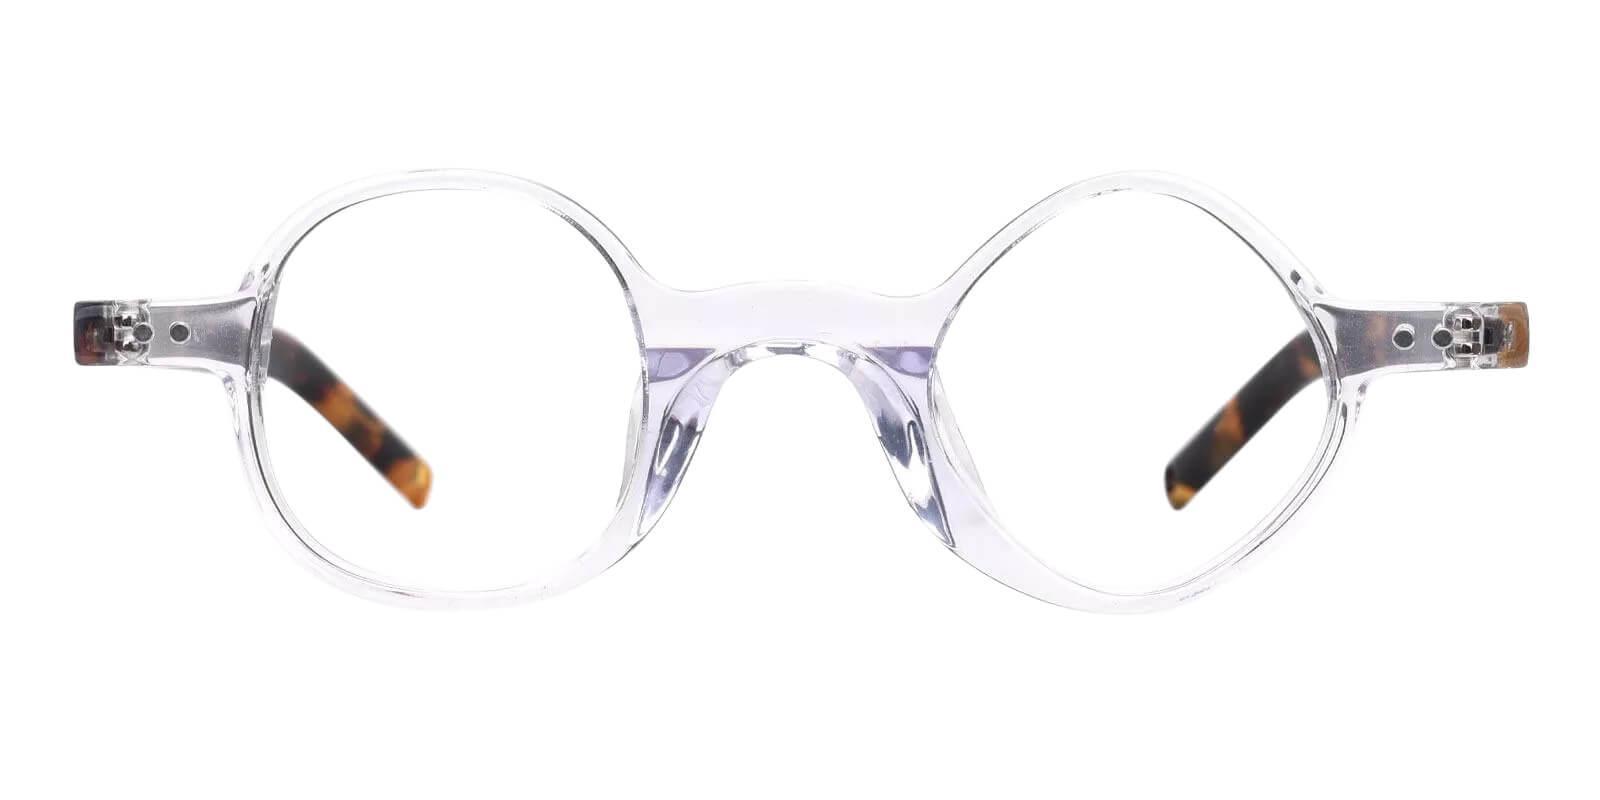 Tersaki Translucent TR Eyeglasses , Fashion , NosePads Frames from ABBE Glasses